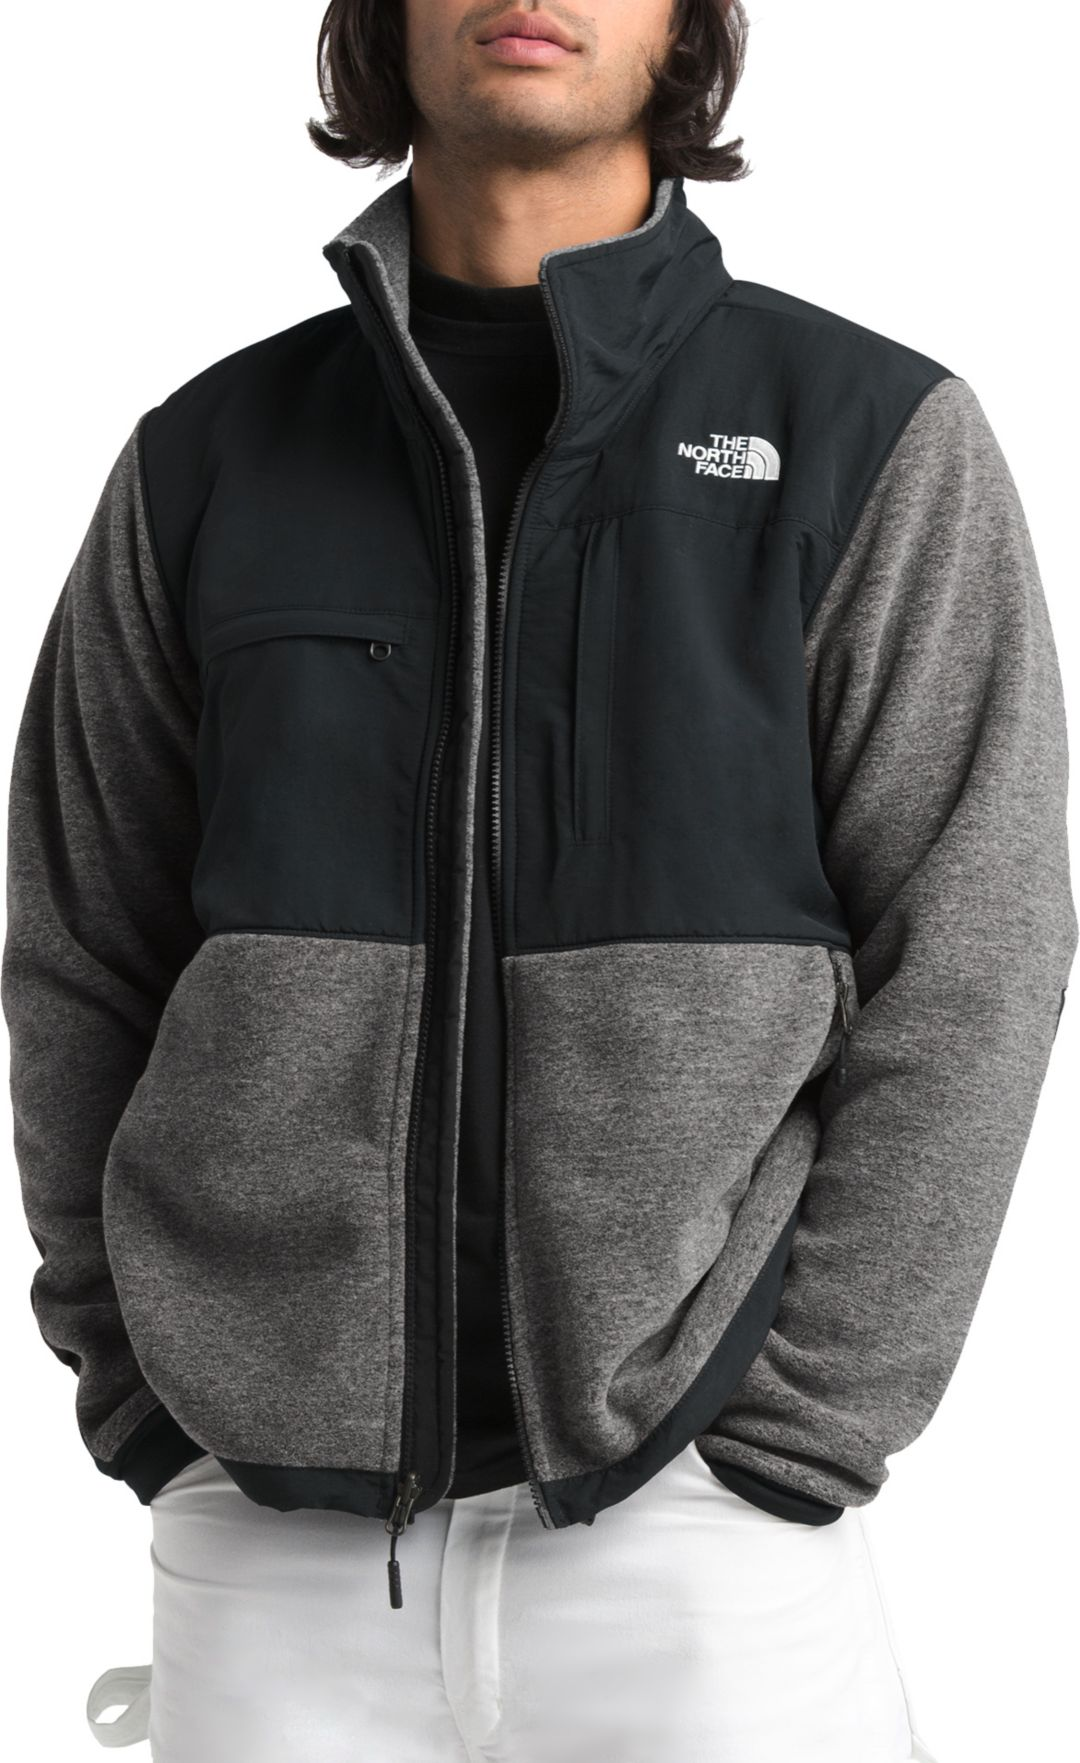 3b83e8bb3 The North Face Men's Denali 2 Jacket